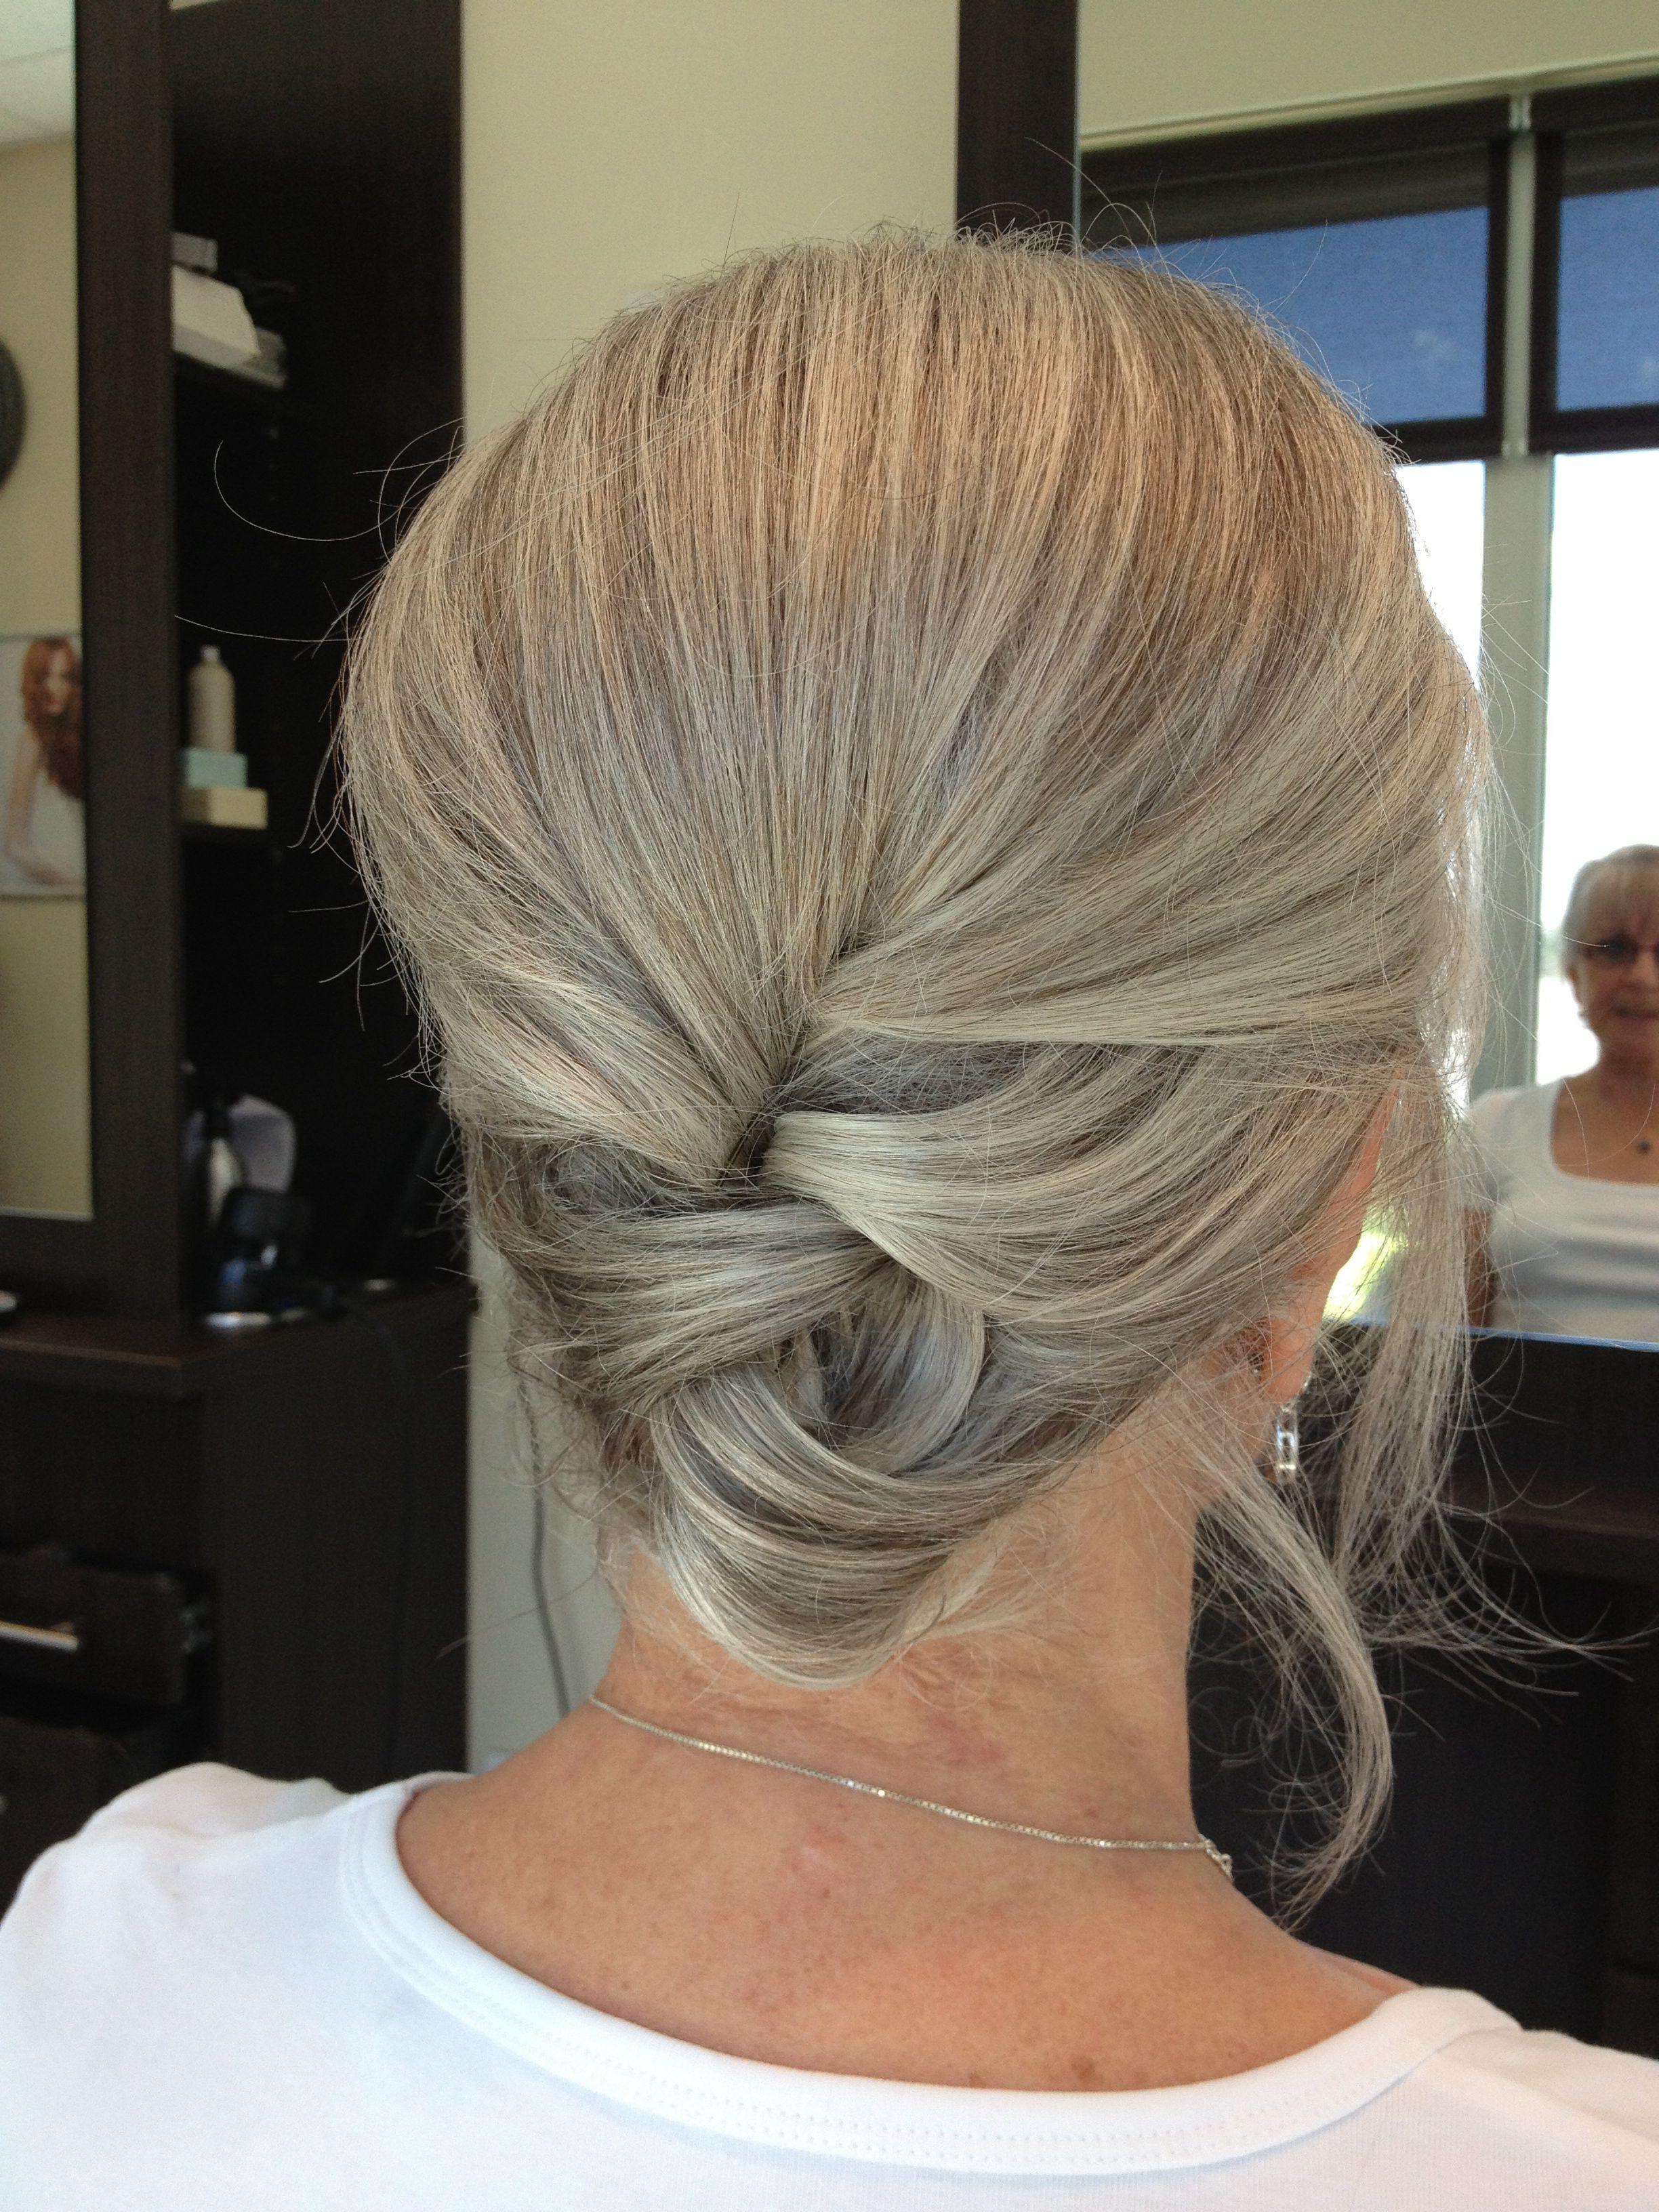 Pin by Isabella Thomas on Hair do's | Short hair styles